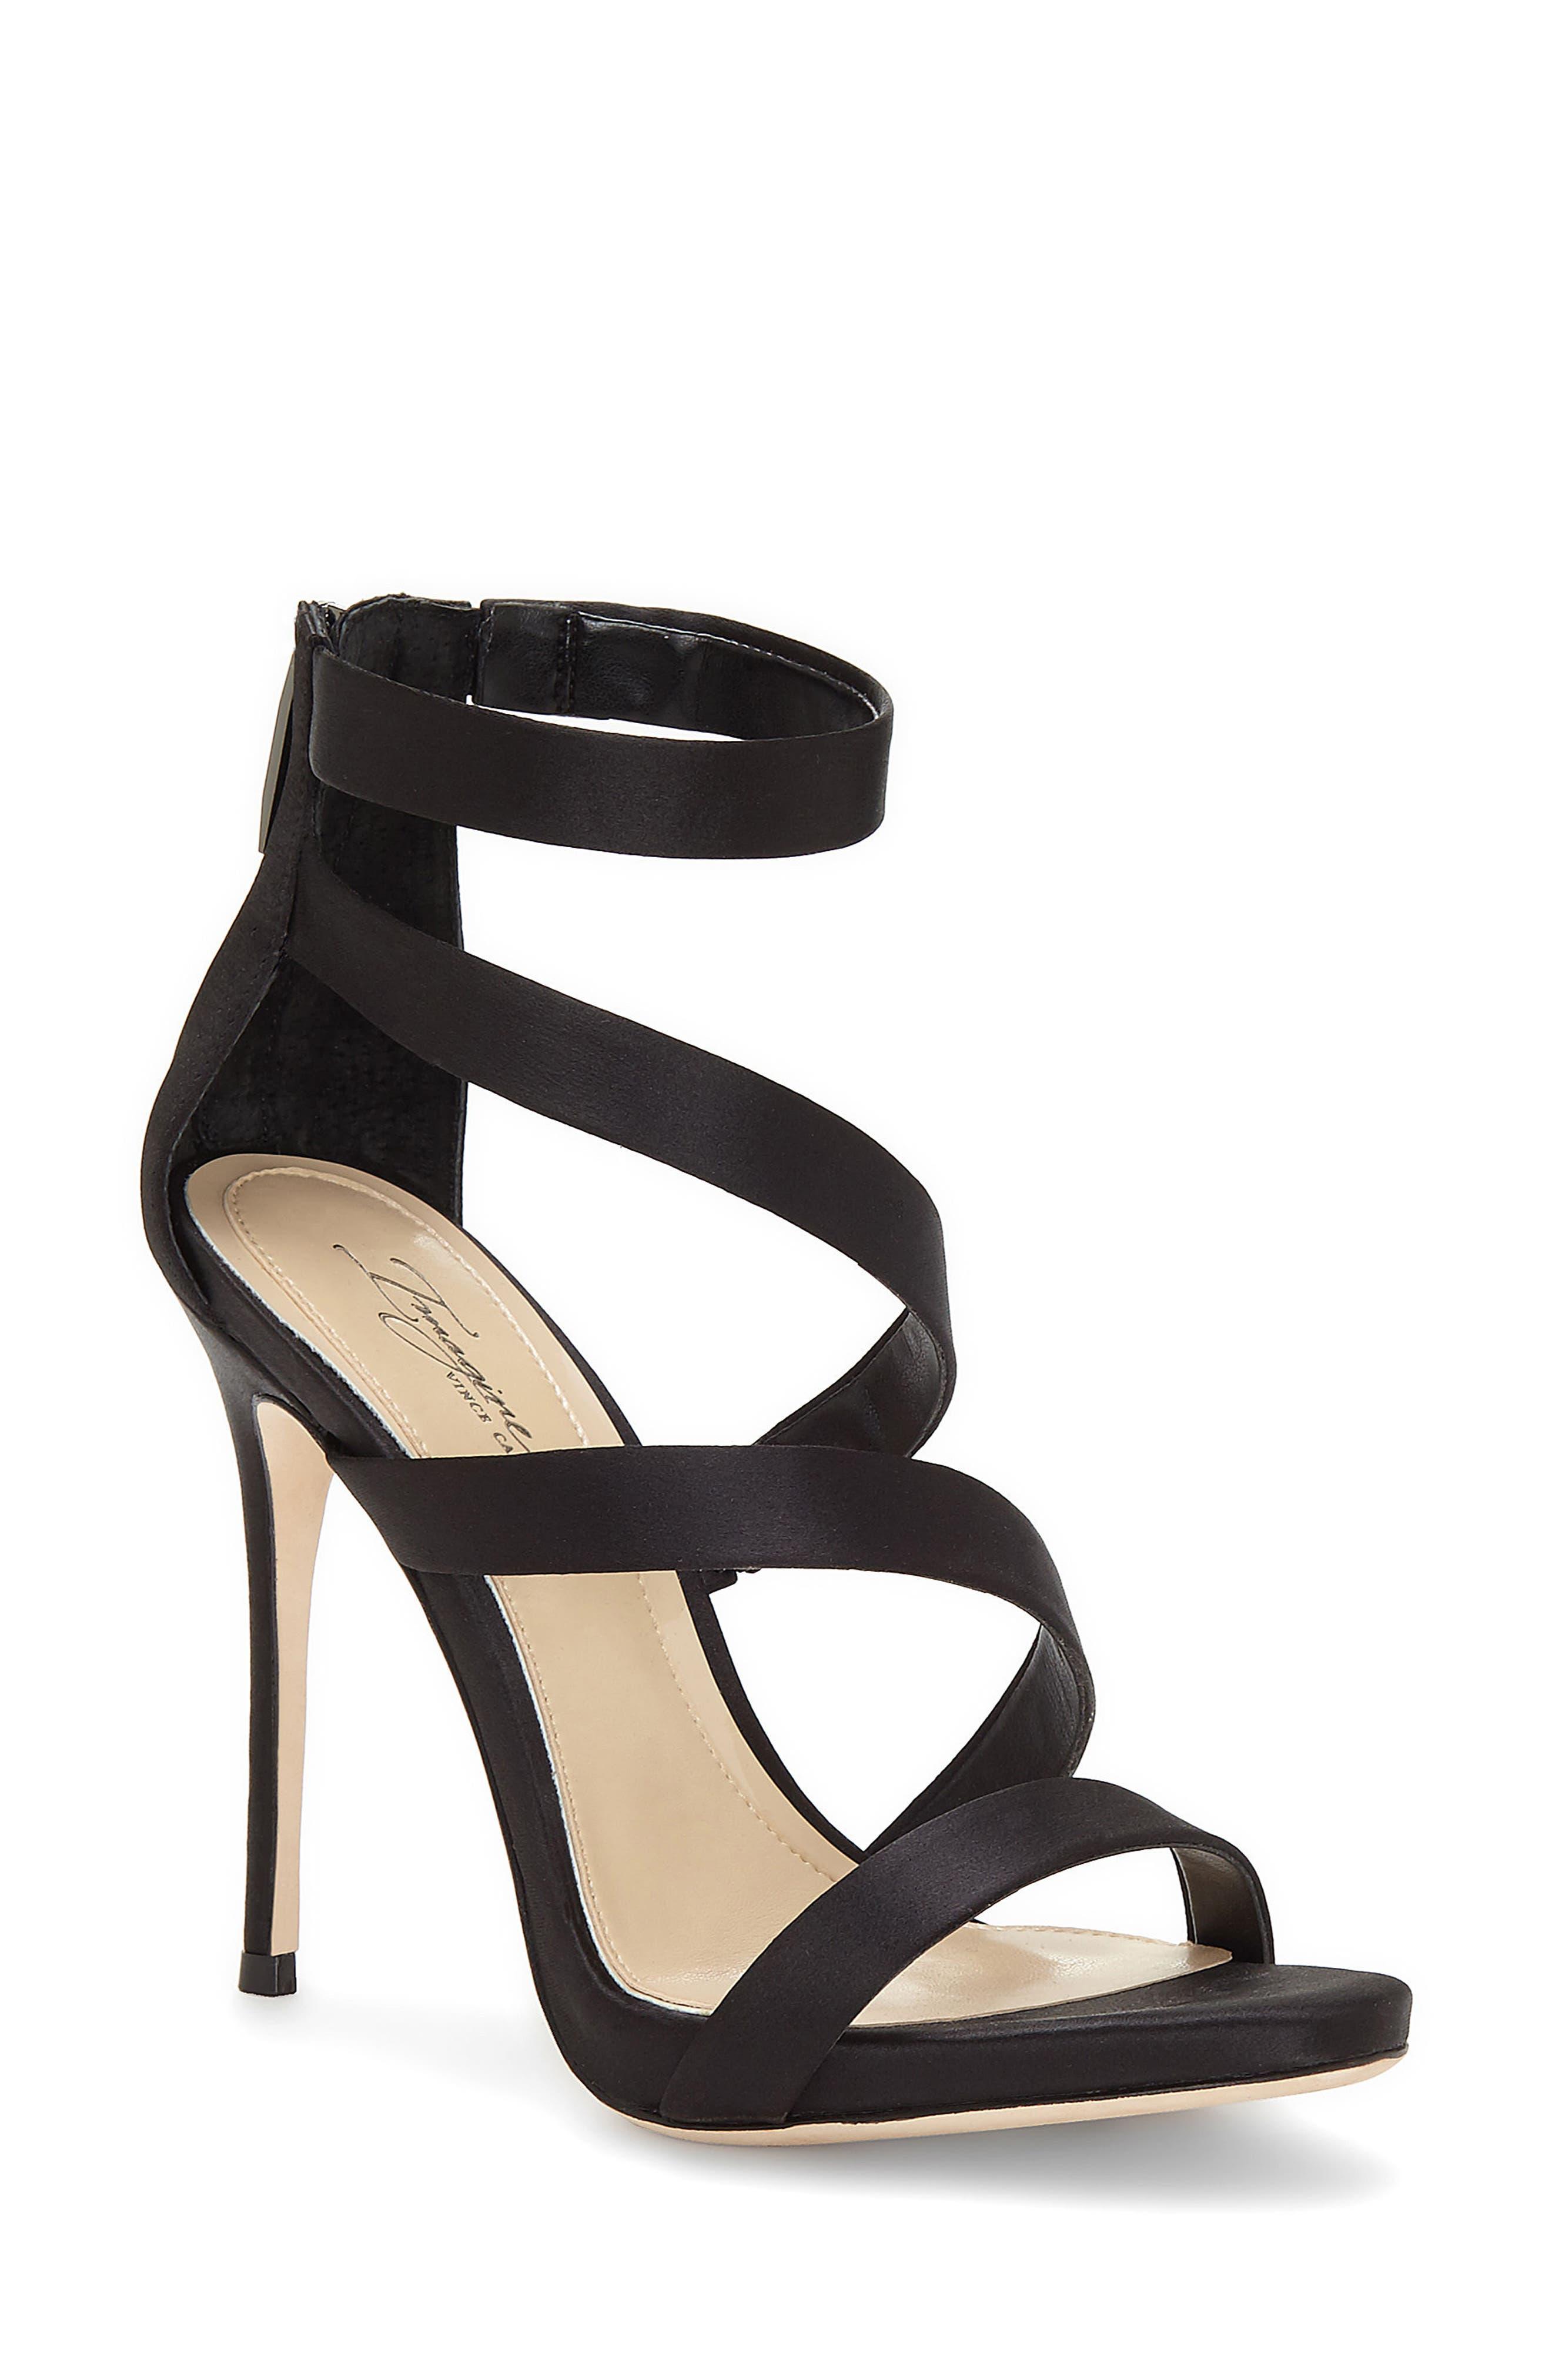 Imagine Vince Camuto Dalles Tall Strappy Sandal,                             Main thumbnail 1, color,                             BLACK SATIN